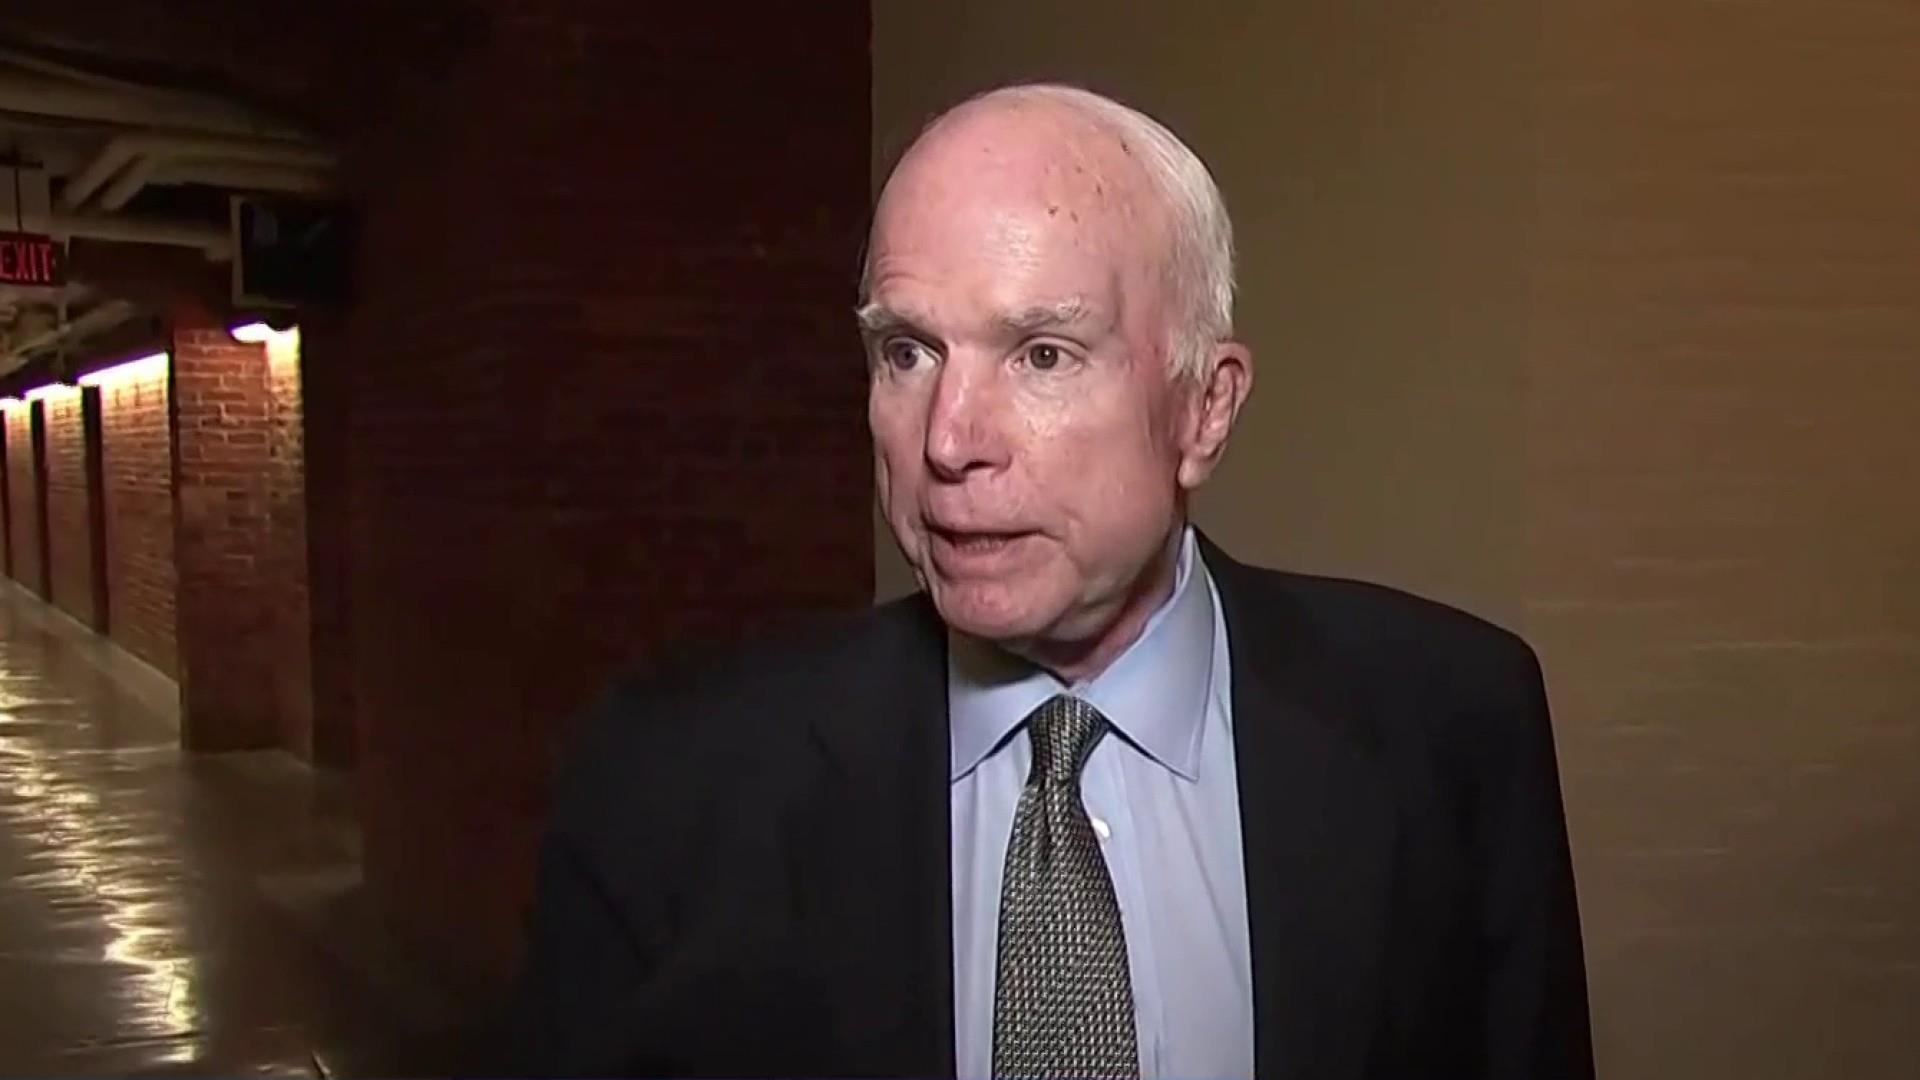 What will politics look like without Senator John McCain?